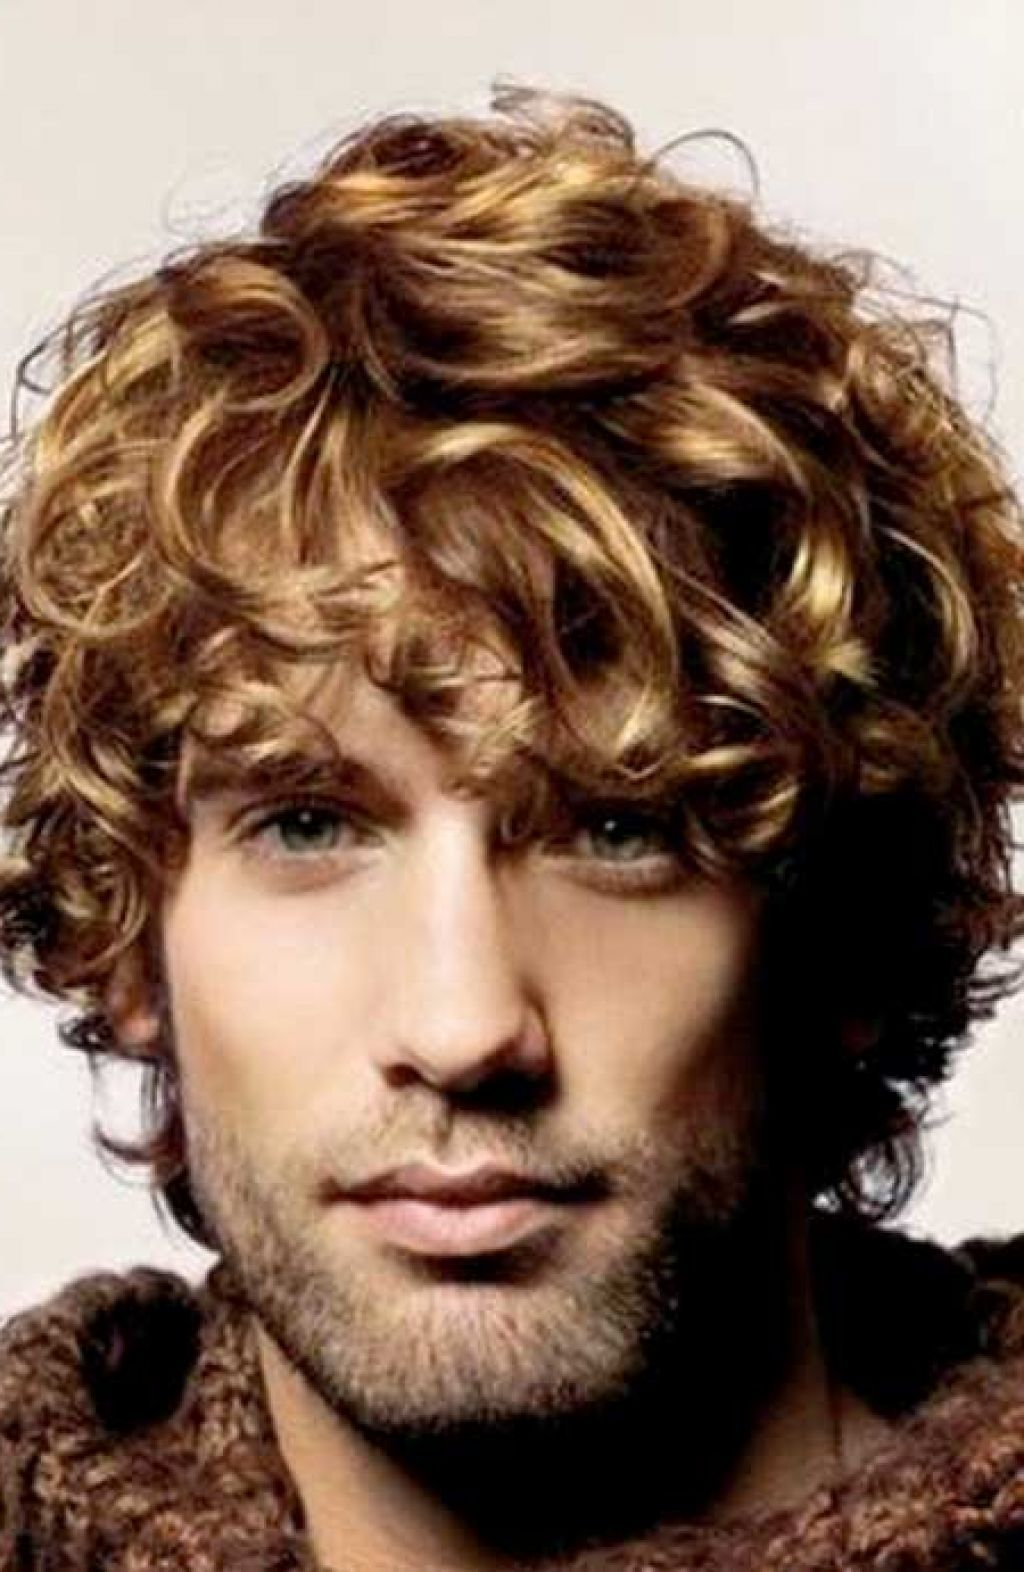 Popular Medium Hairstyles For Men Medium Haircuts Long Curly Hair Men Male Haircuts Curly Curly Hair Men